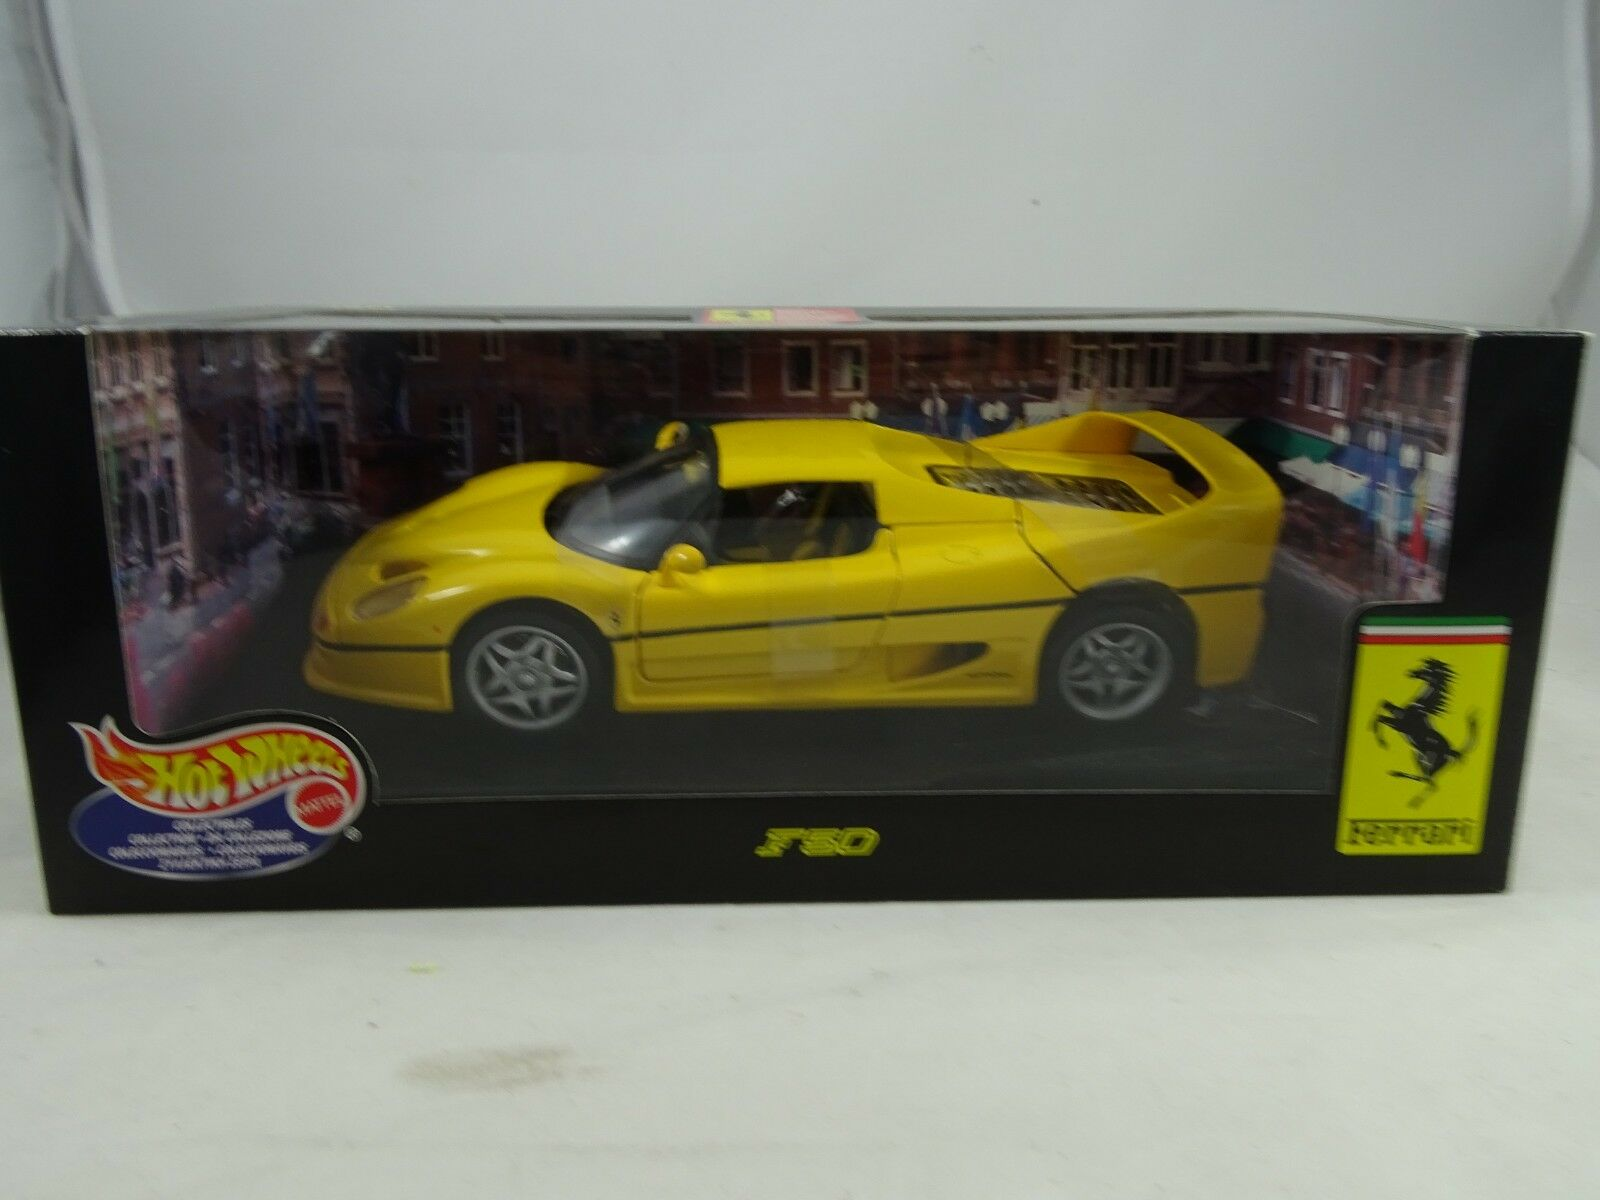 1 18 Hot Wheels Ferrari F50 Yellow - Rarity